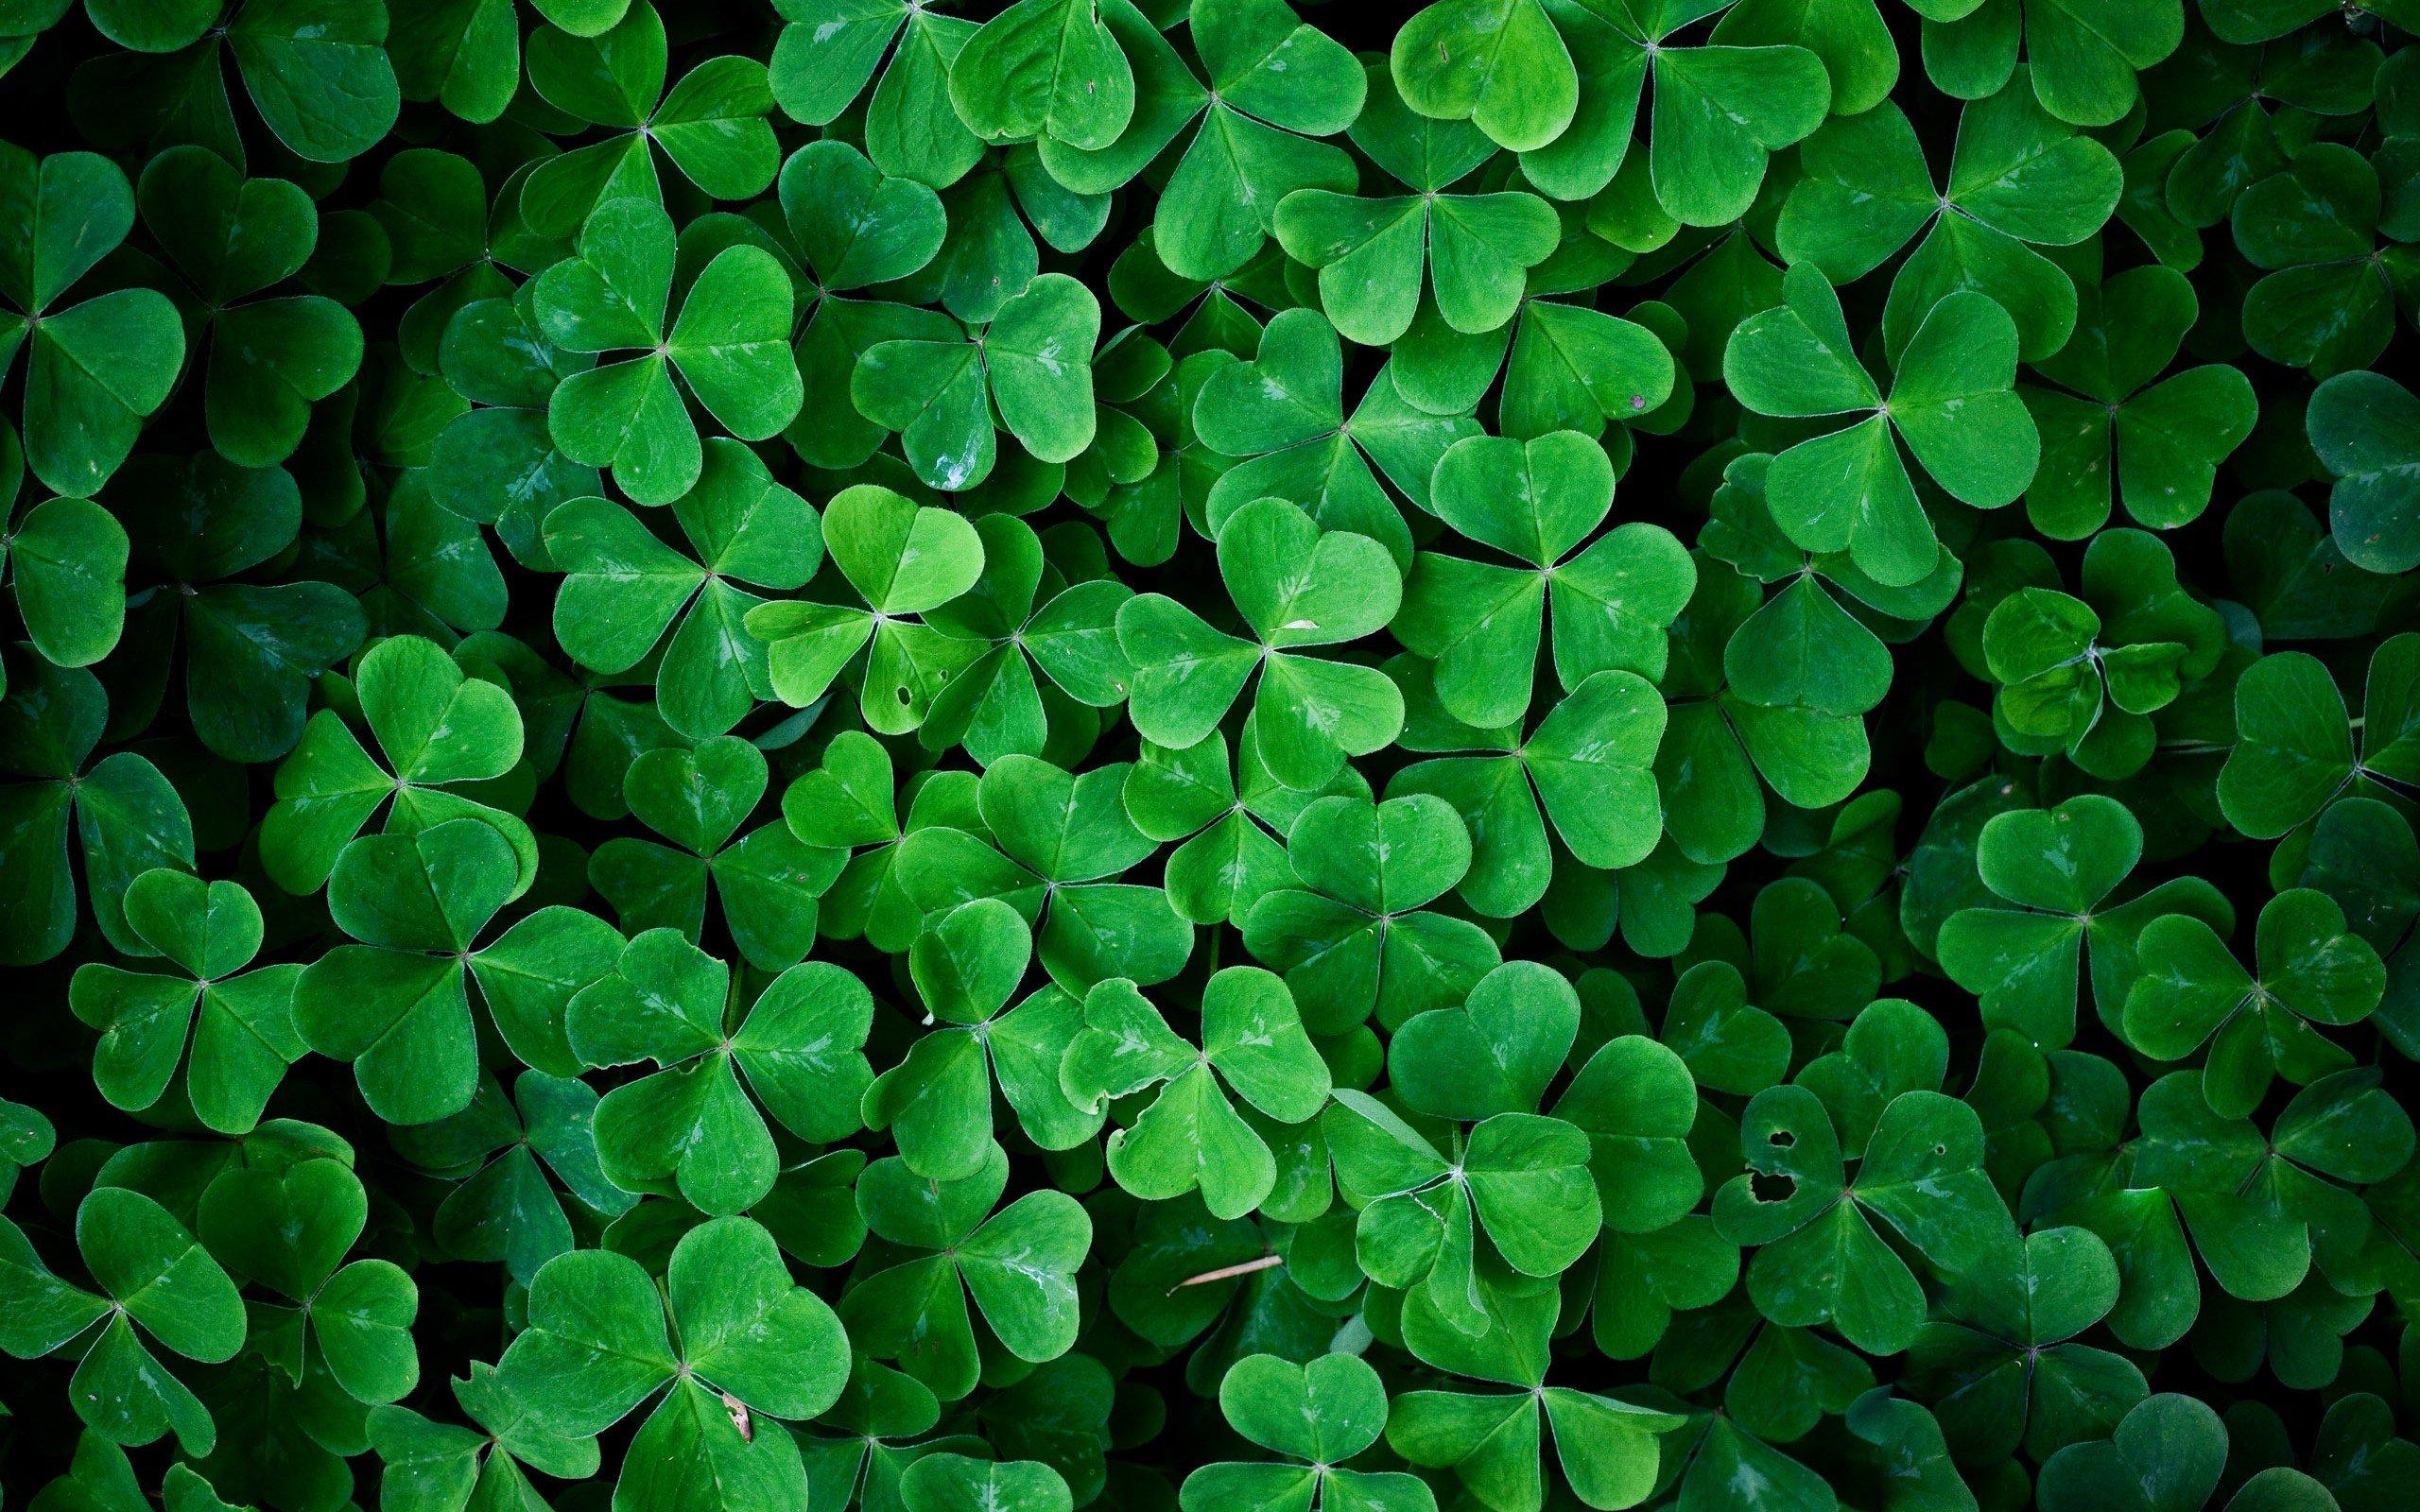 green leaf wallpaper image - photo #26